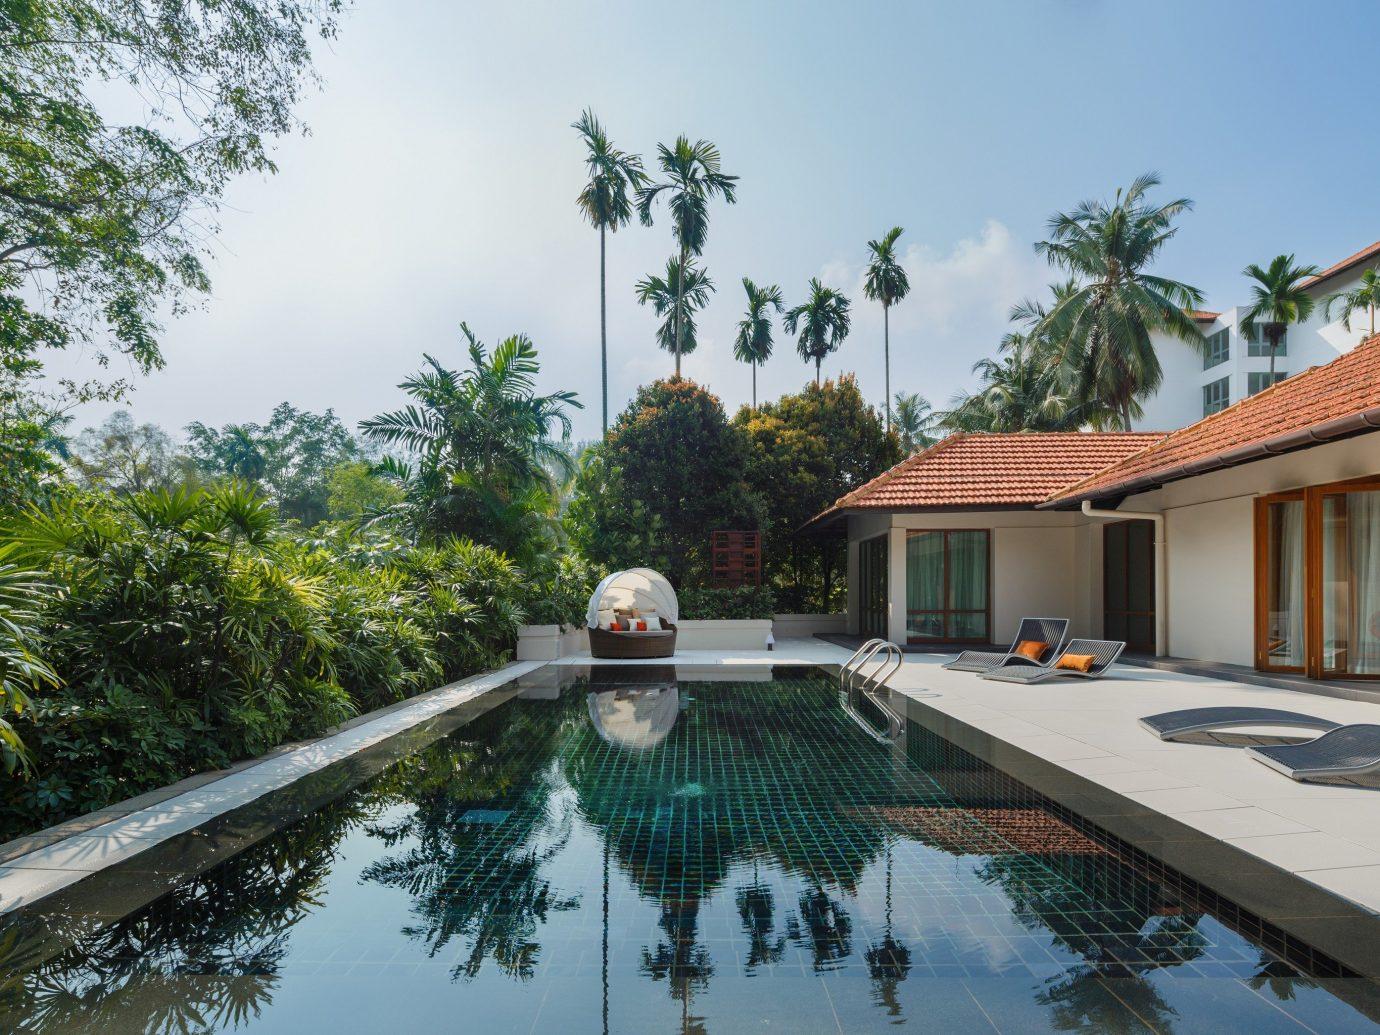 Hotels Romance tree sky outdoor swimming pool property leisure Resort estate vacation Villa real estate condominium mansion